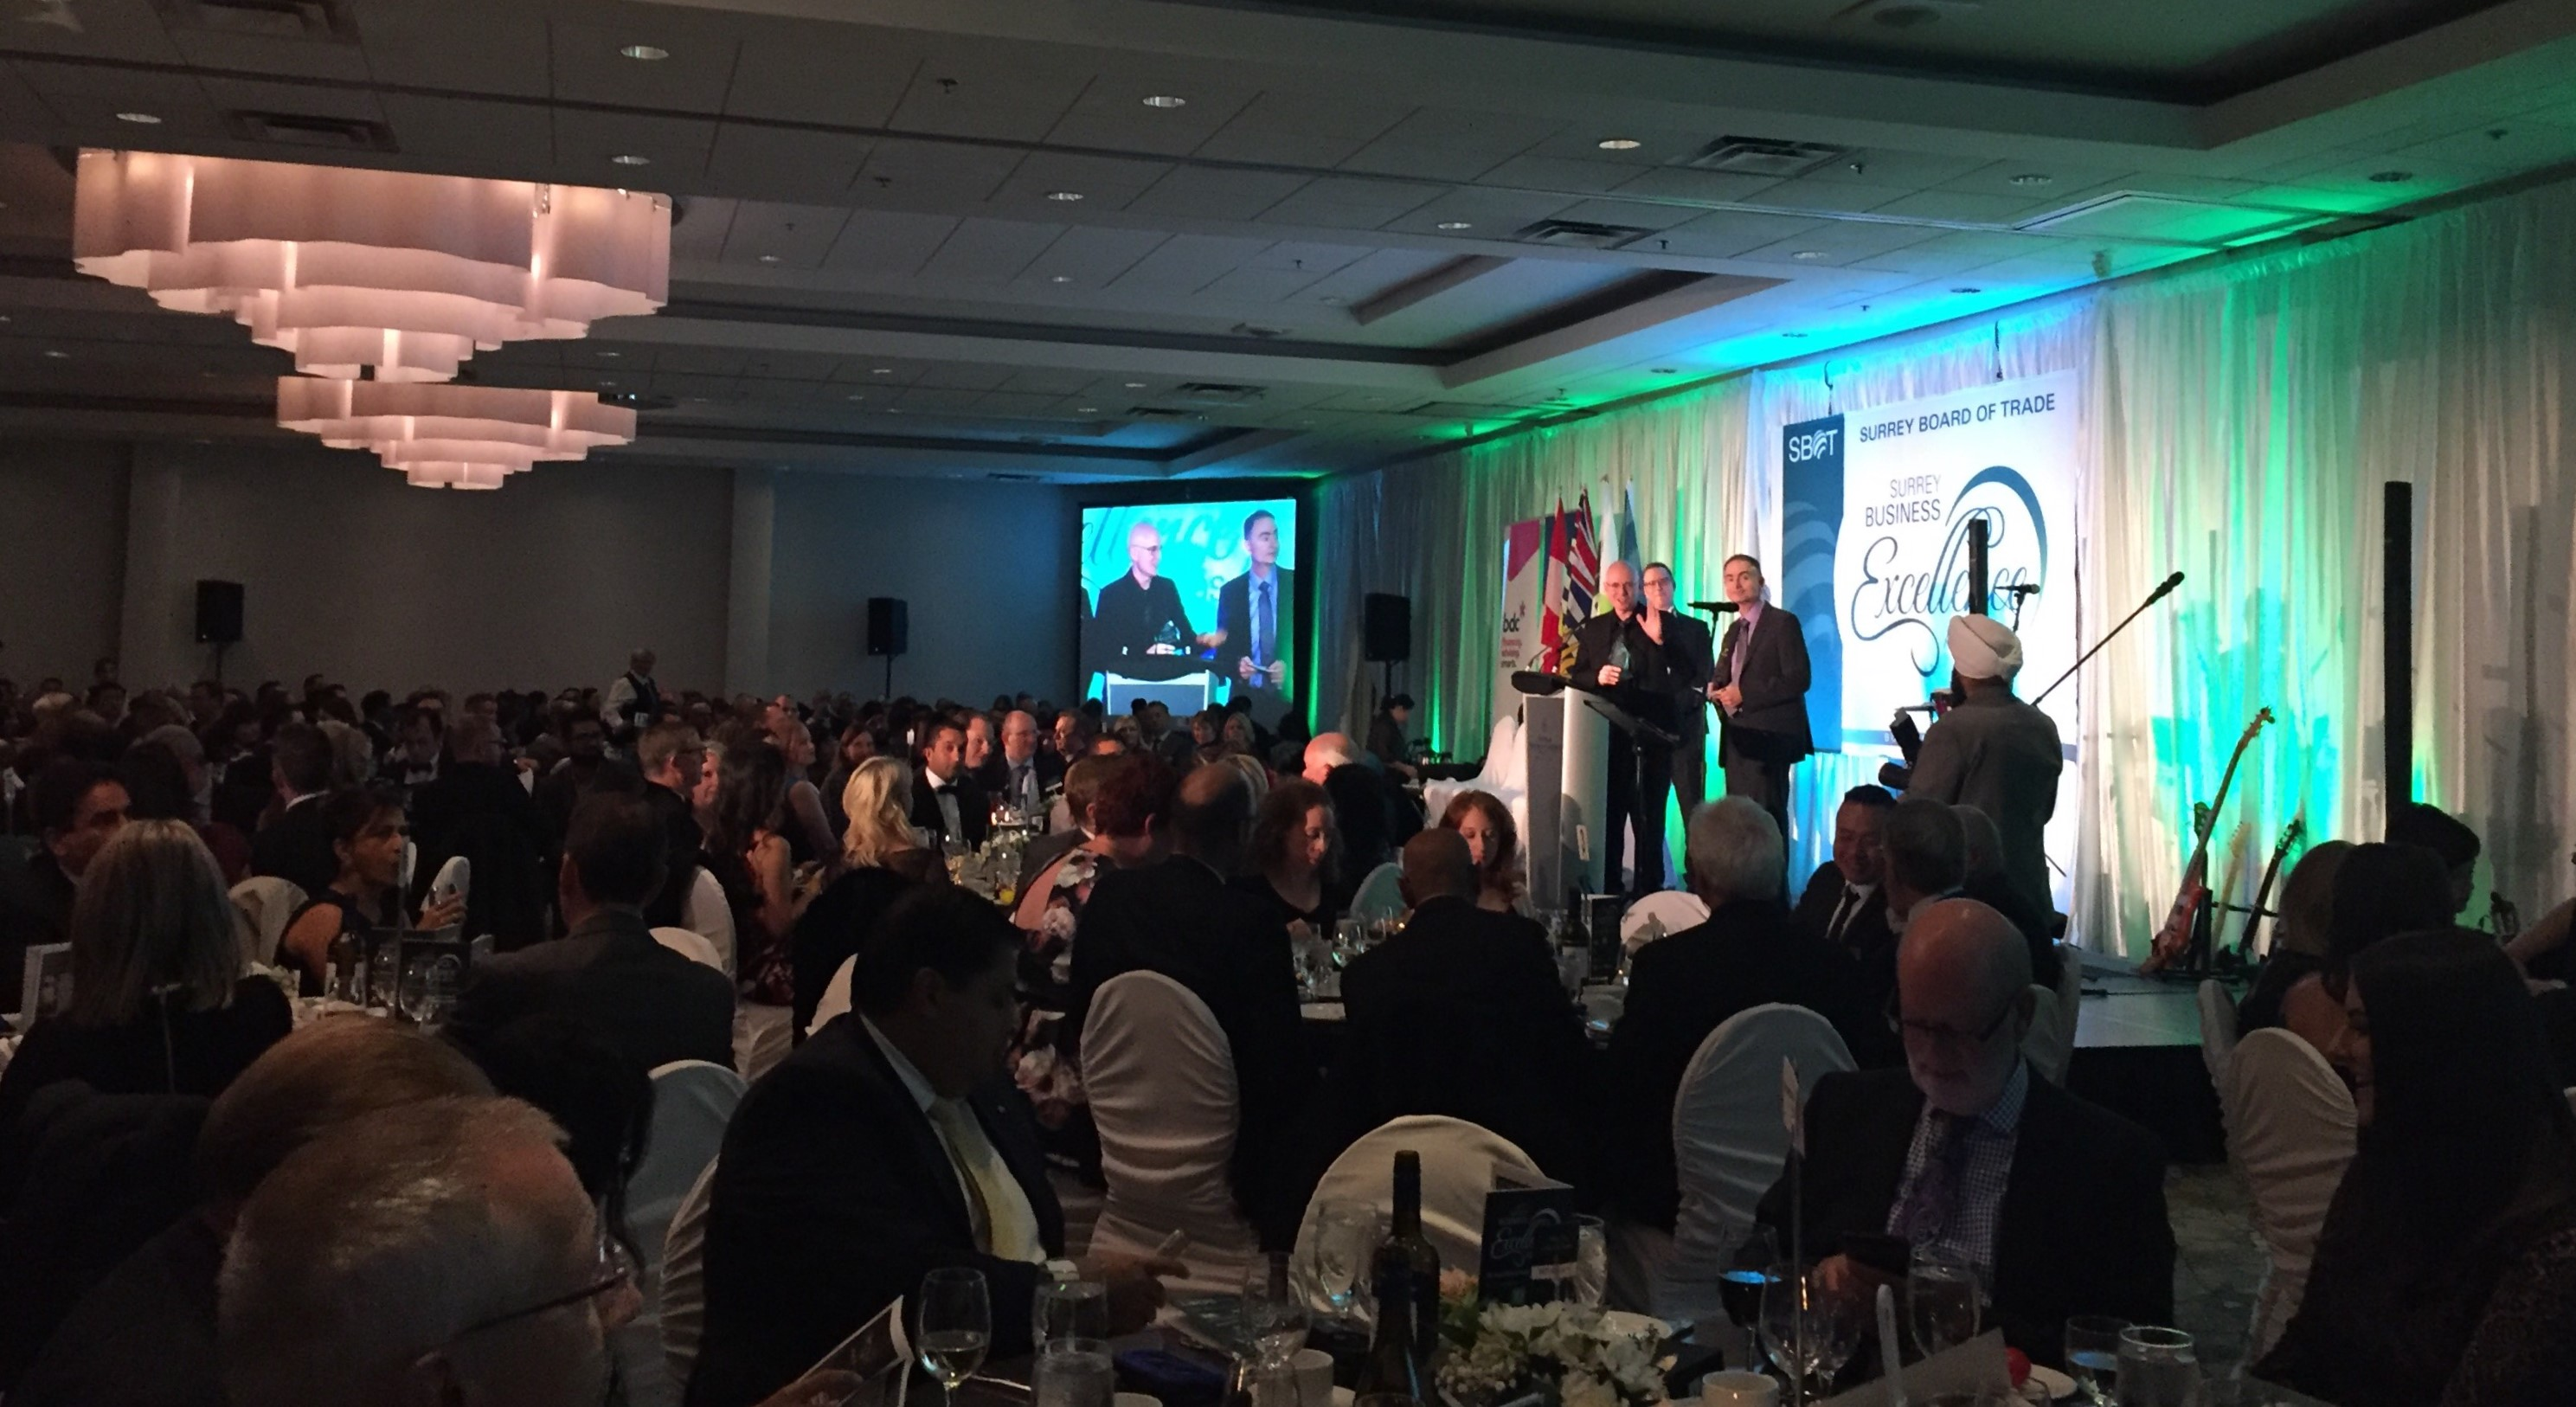 Surrey Business Excellence Awards 2017 - Safe Software